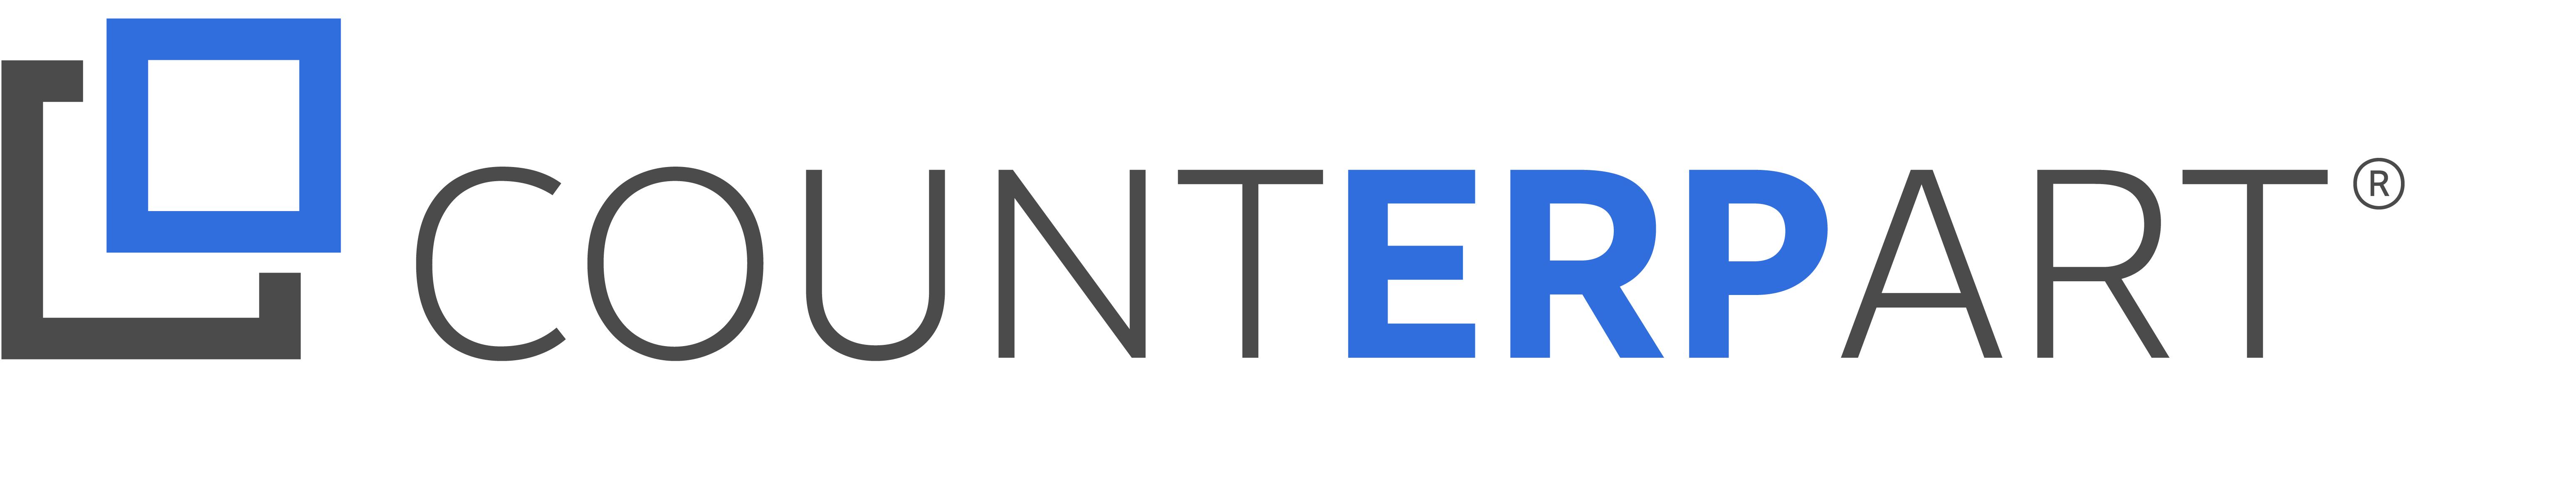 COUNTERPART ETO ERP Profiled in Robotics Tomorrow